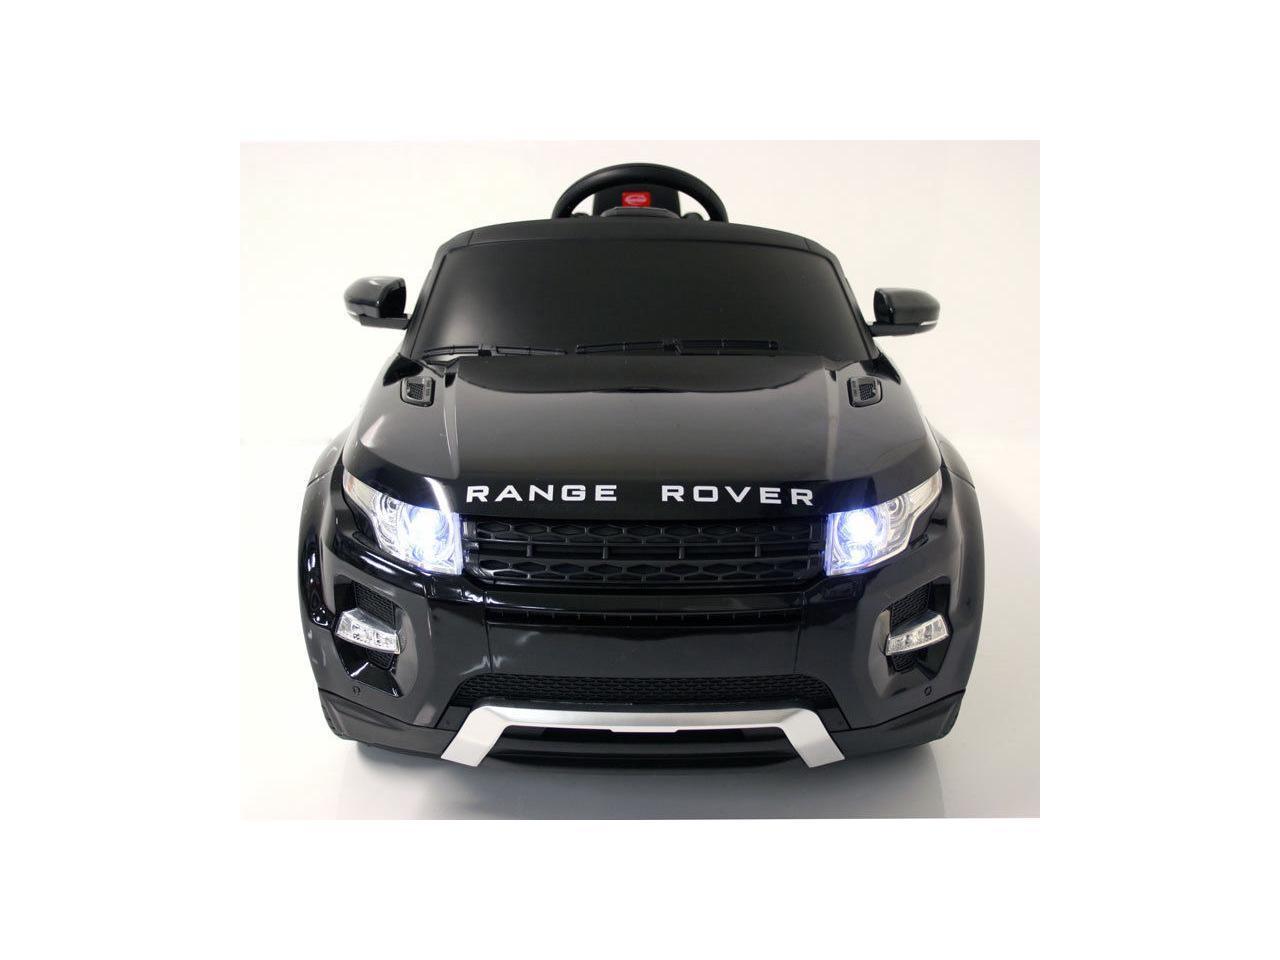 12V AC//DC POWER SUPPLY ADAPTER FOR KIDS RIDE RANGE ROVER EVOQUE CAR